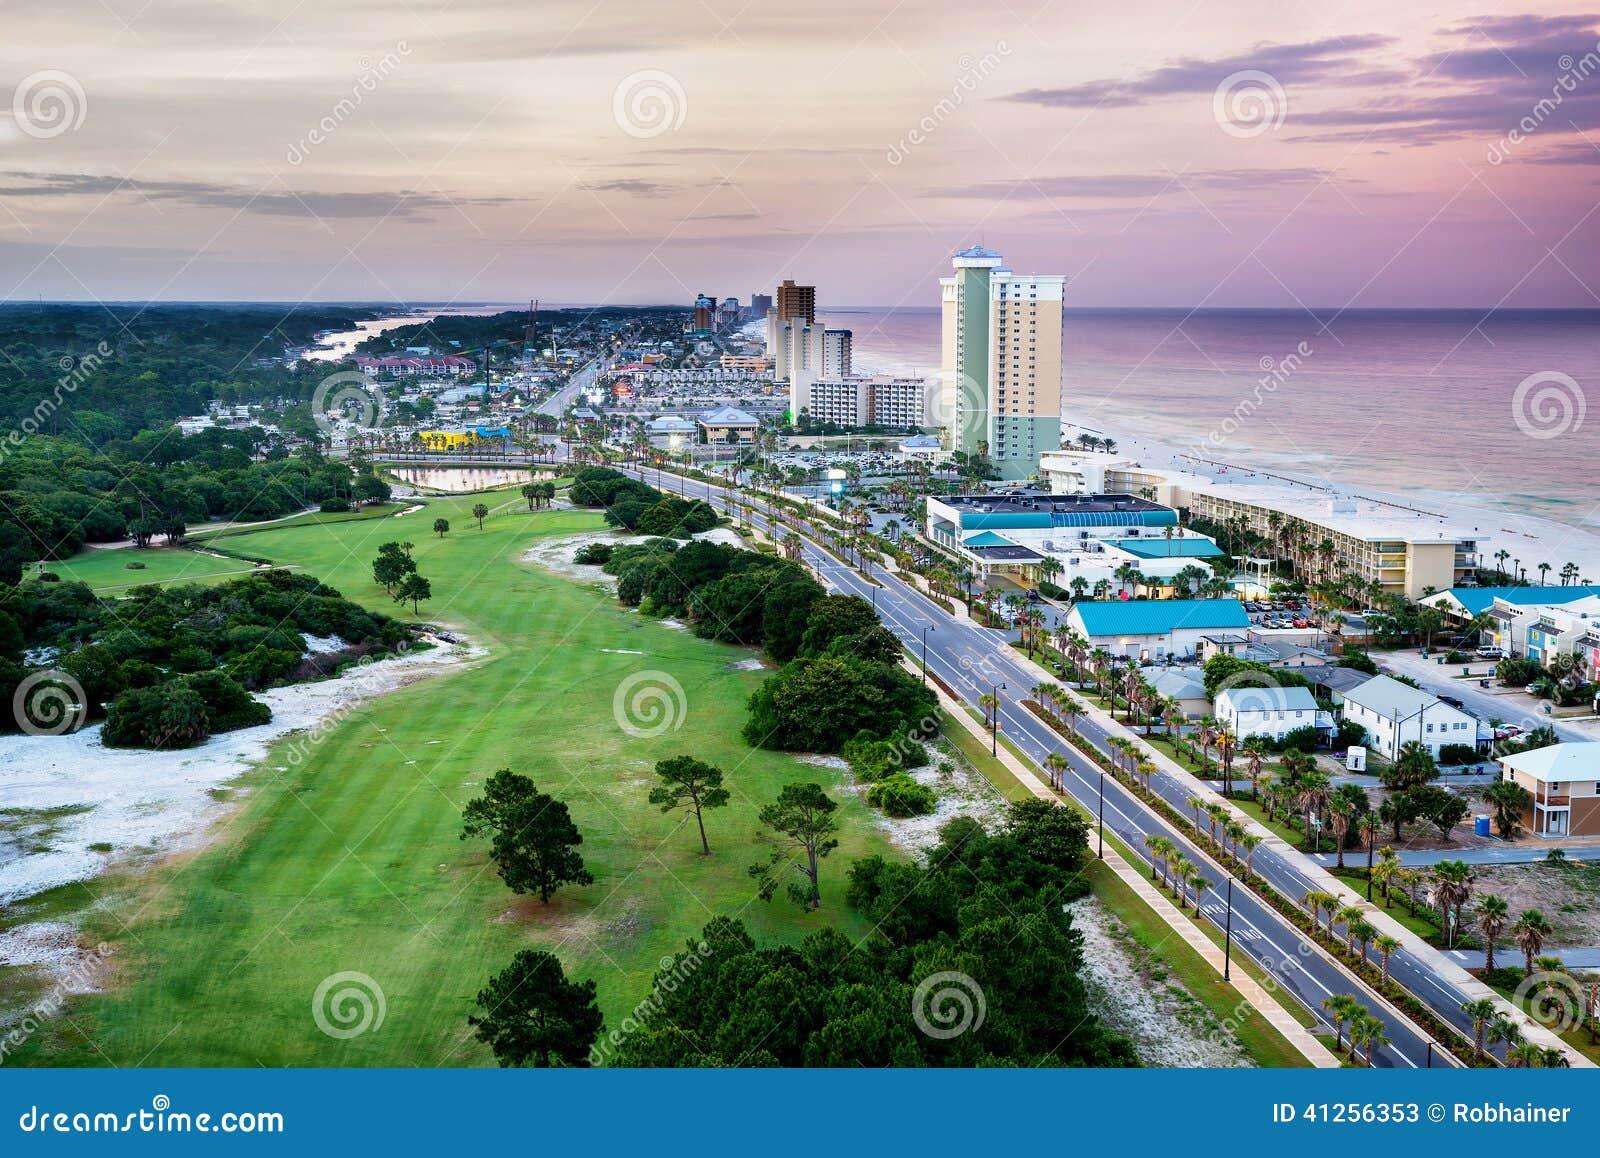 Sunrise Time Panama City Beach Florida